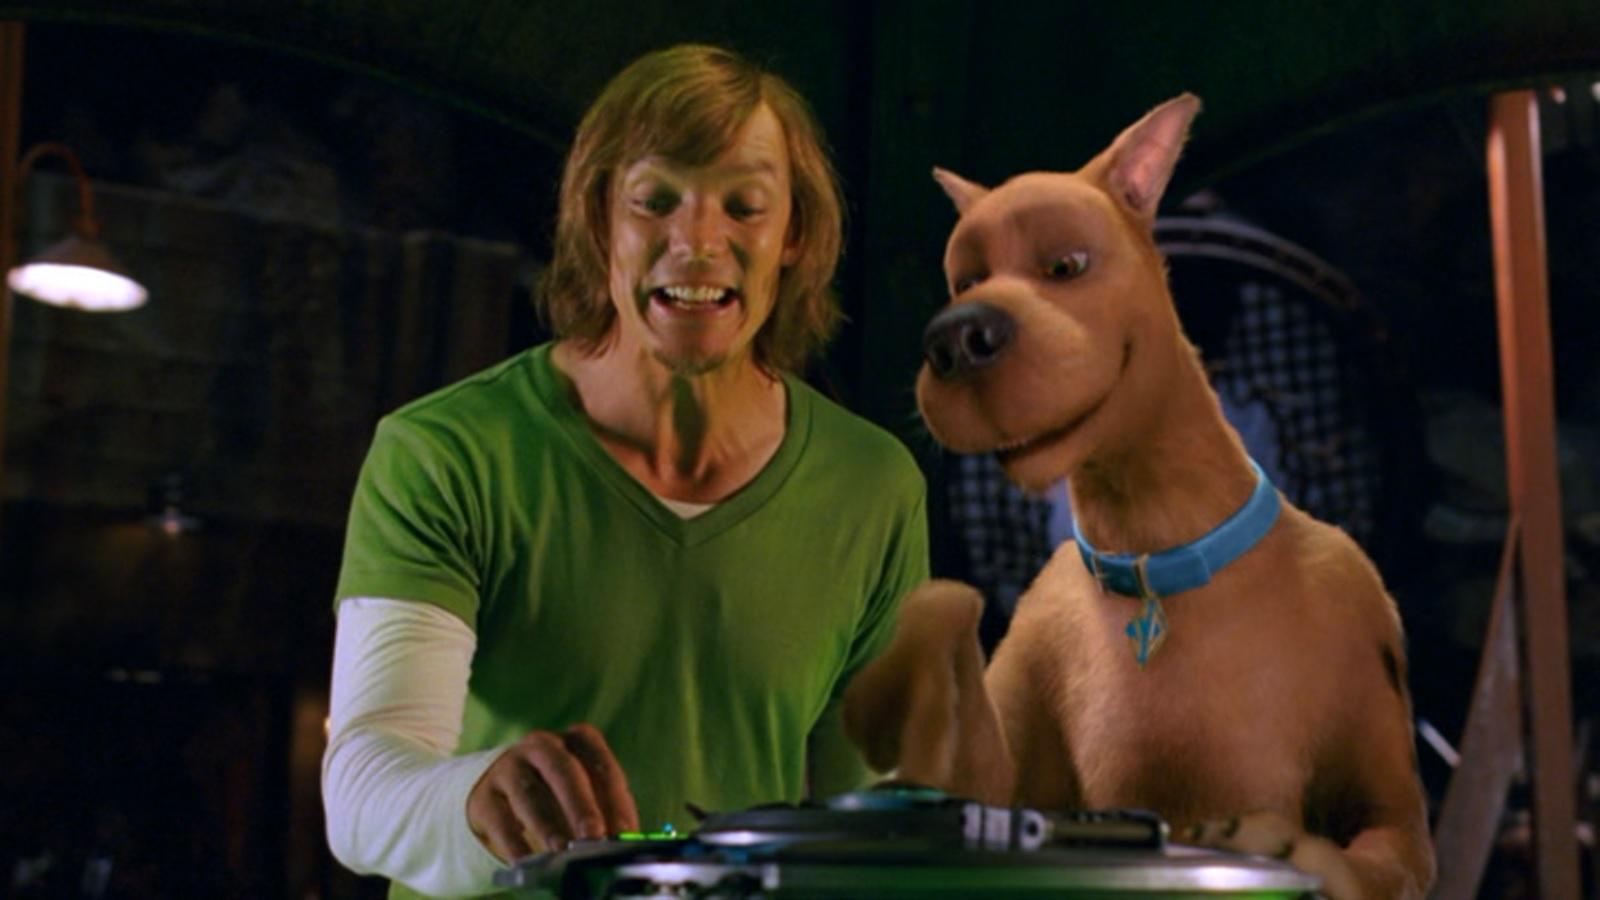 Scooby Doo 2 Monsters Unleashed 2004 Fire Breathing Dimetrodon Time